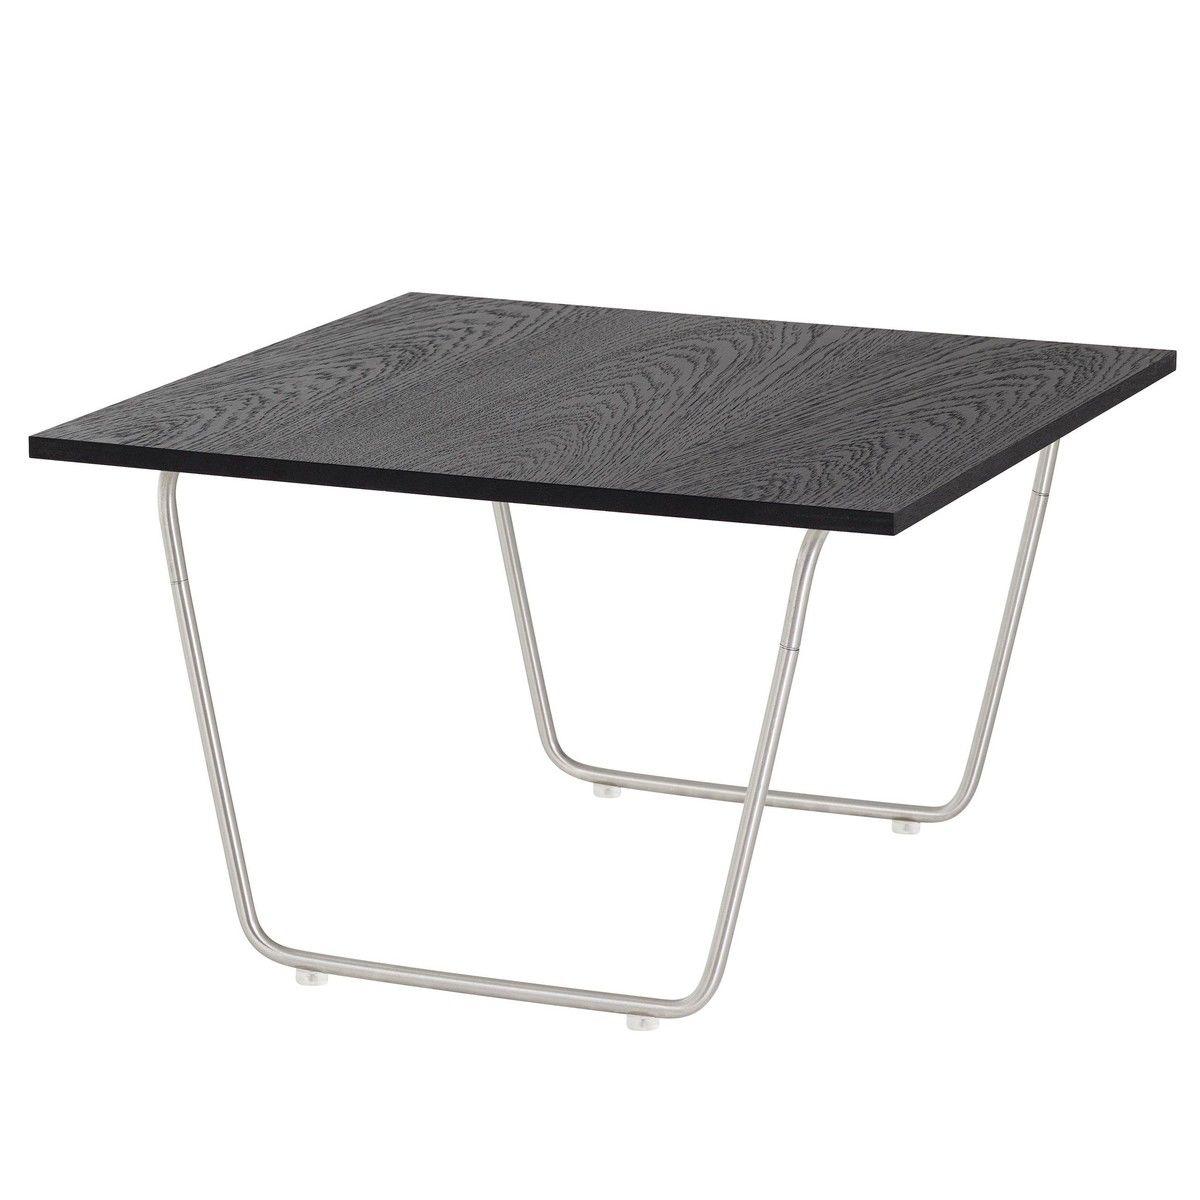 panton bachelor side table montana. Black Bedroom Furniture Sets. Home Design Ideas